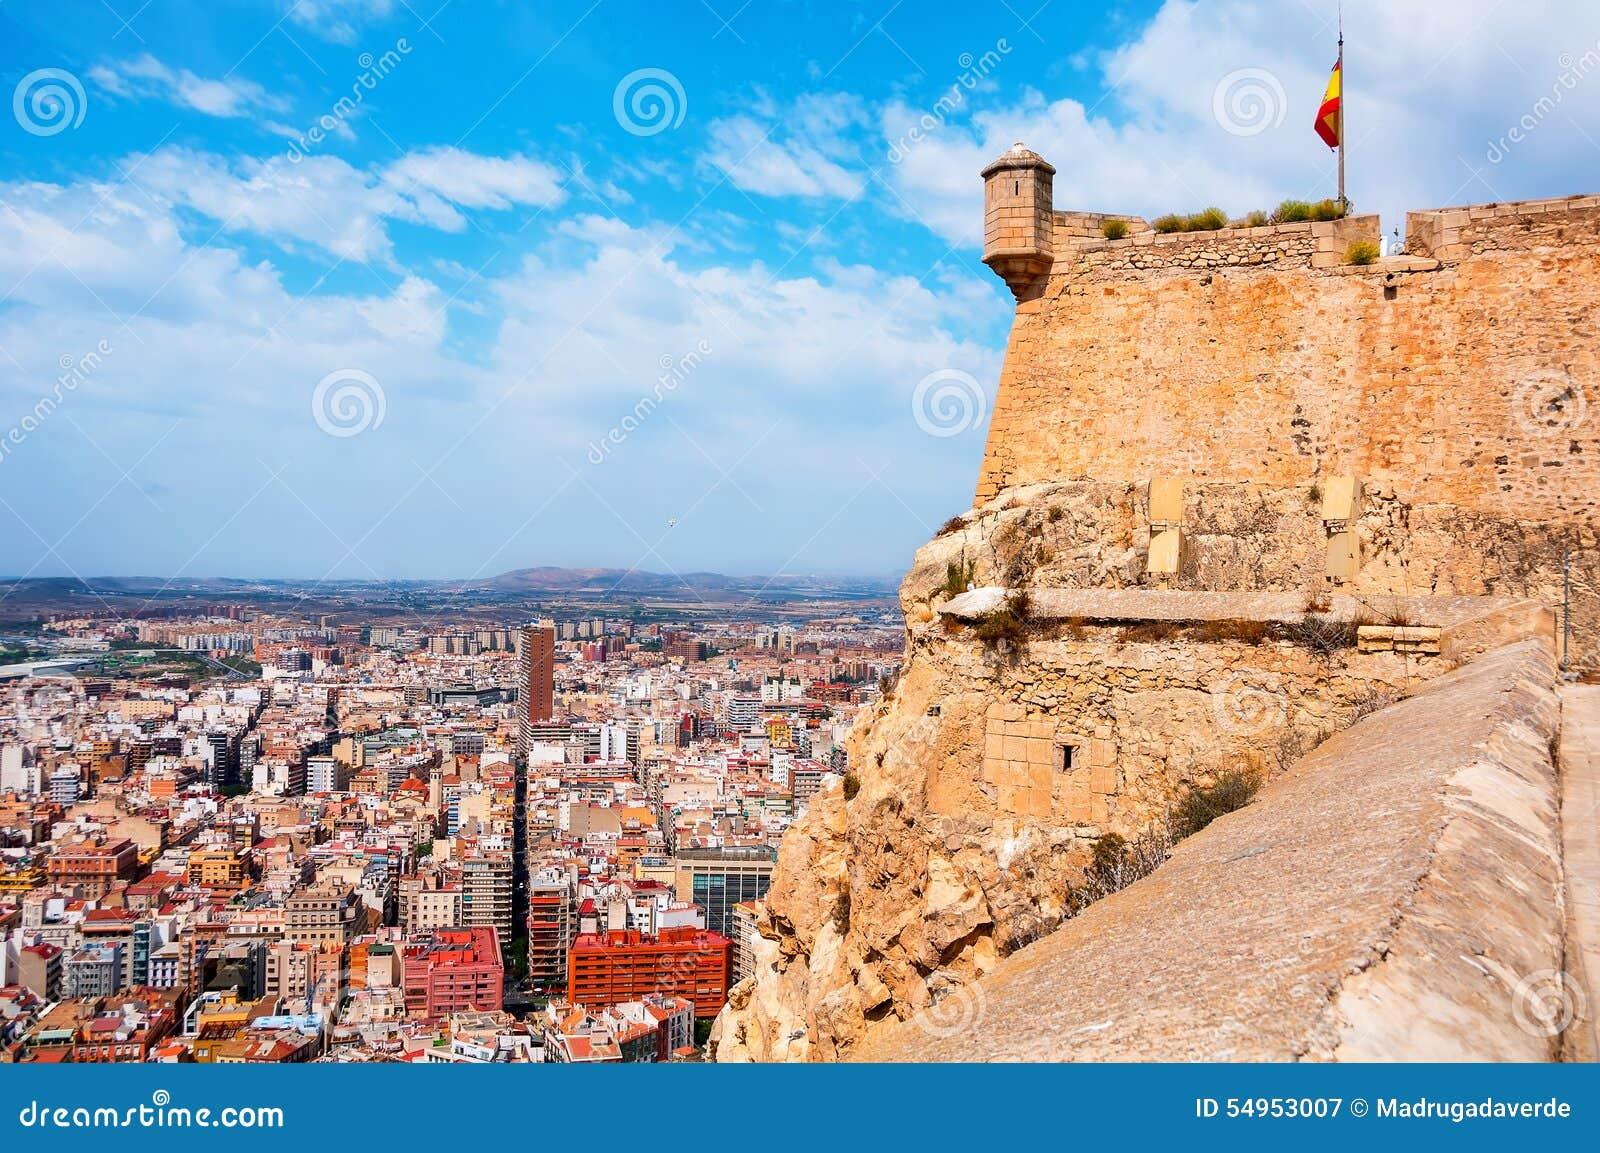 Alicante santa barbara castle in costa blanca stock photo image 54953007 - Stock uno alicante ...